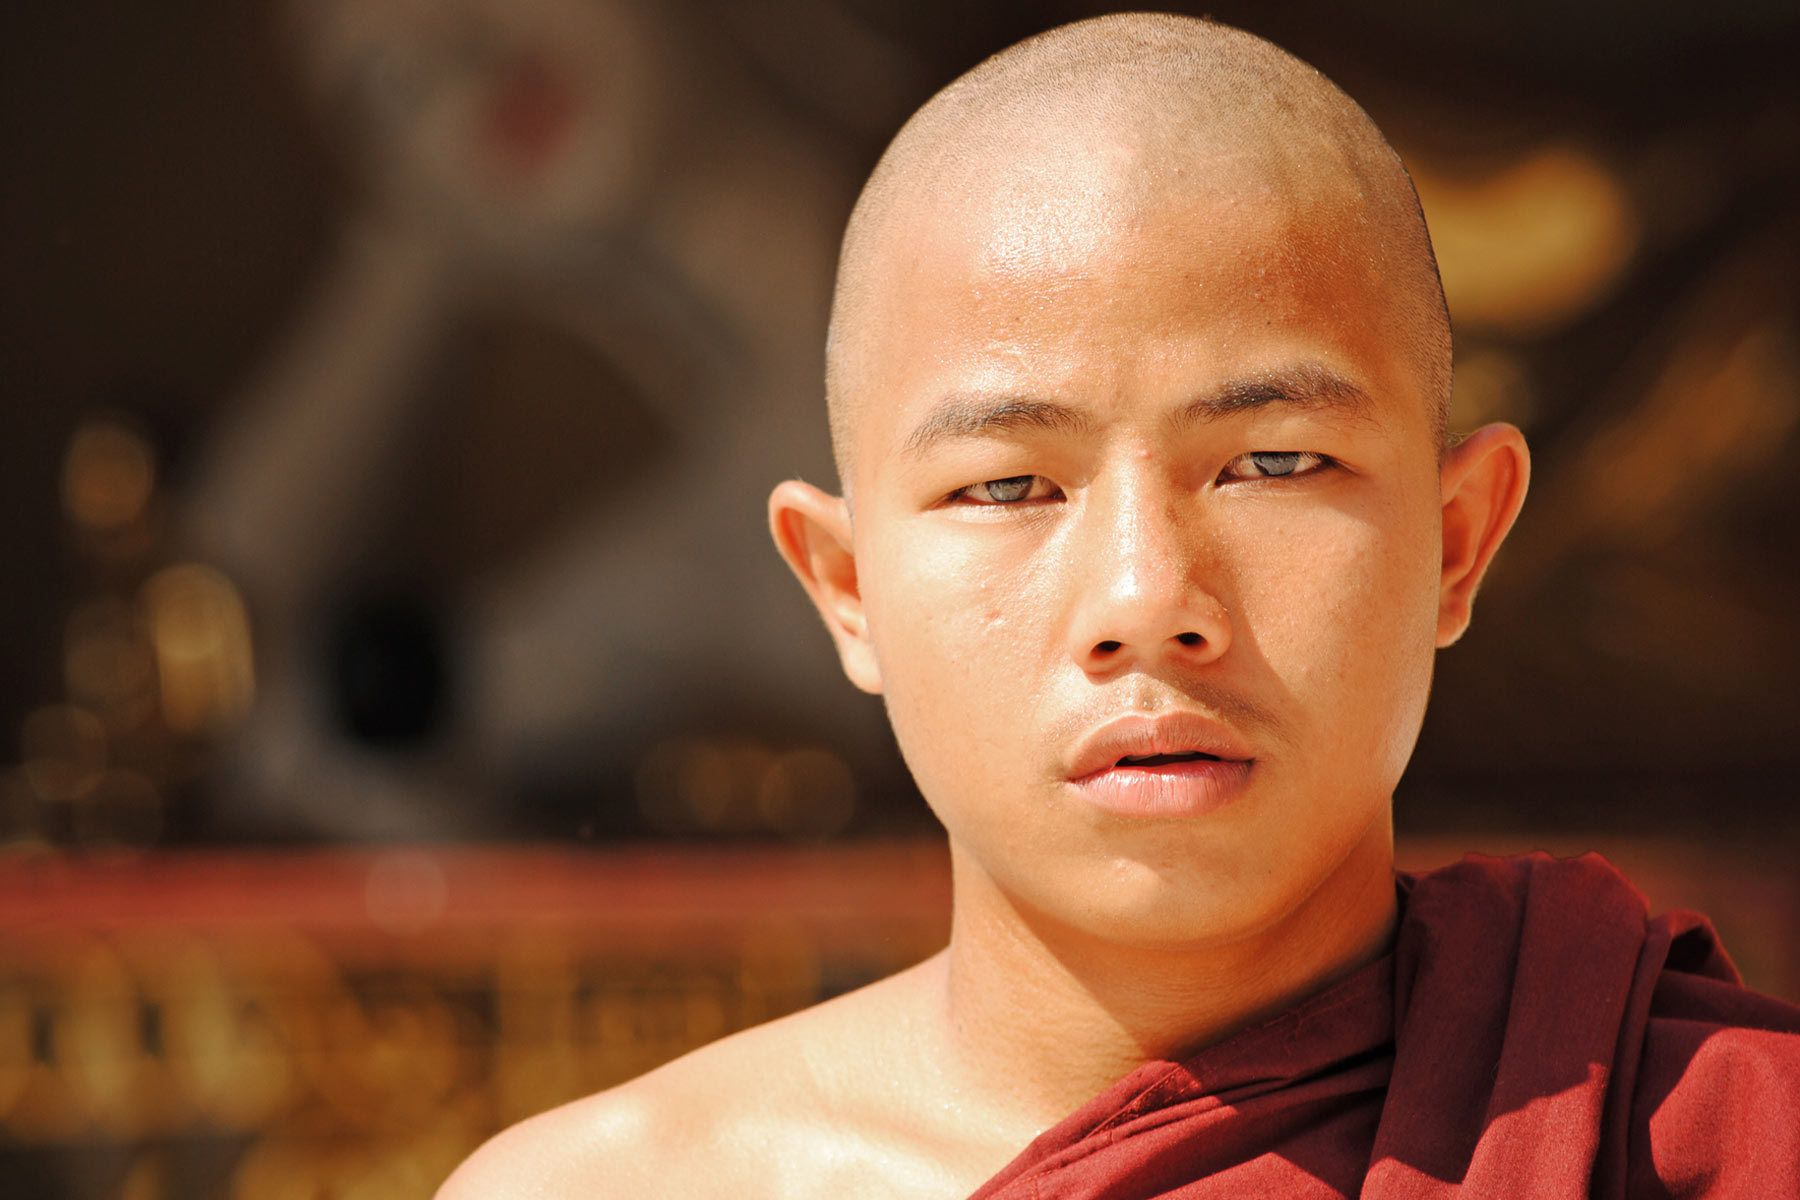 107___yangon_shwedagon_pagoda___compressed.jpg